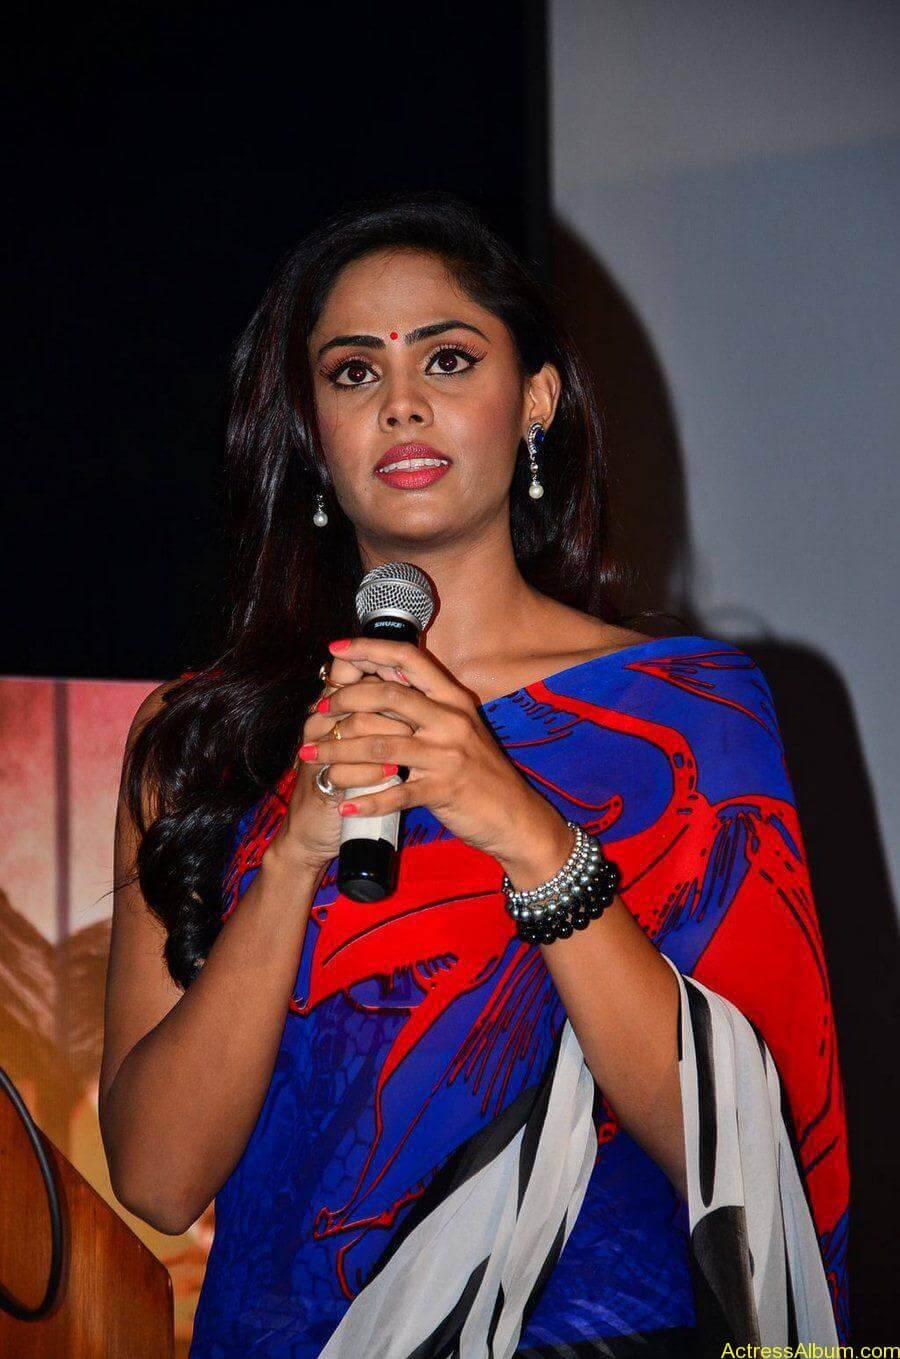 Tamil Actress Karthika Nair Hot in Blue Dress - 3